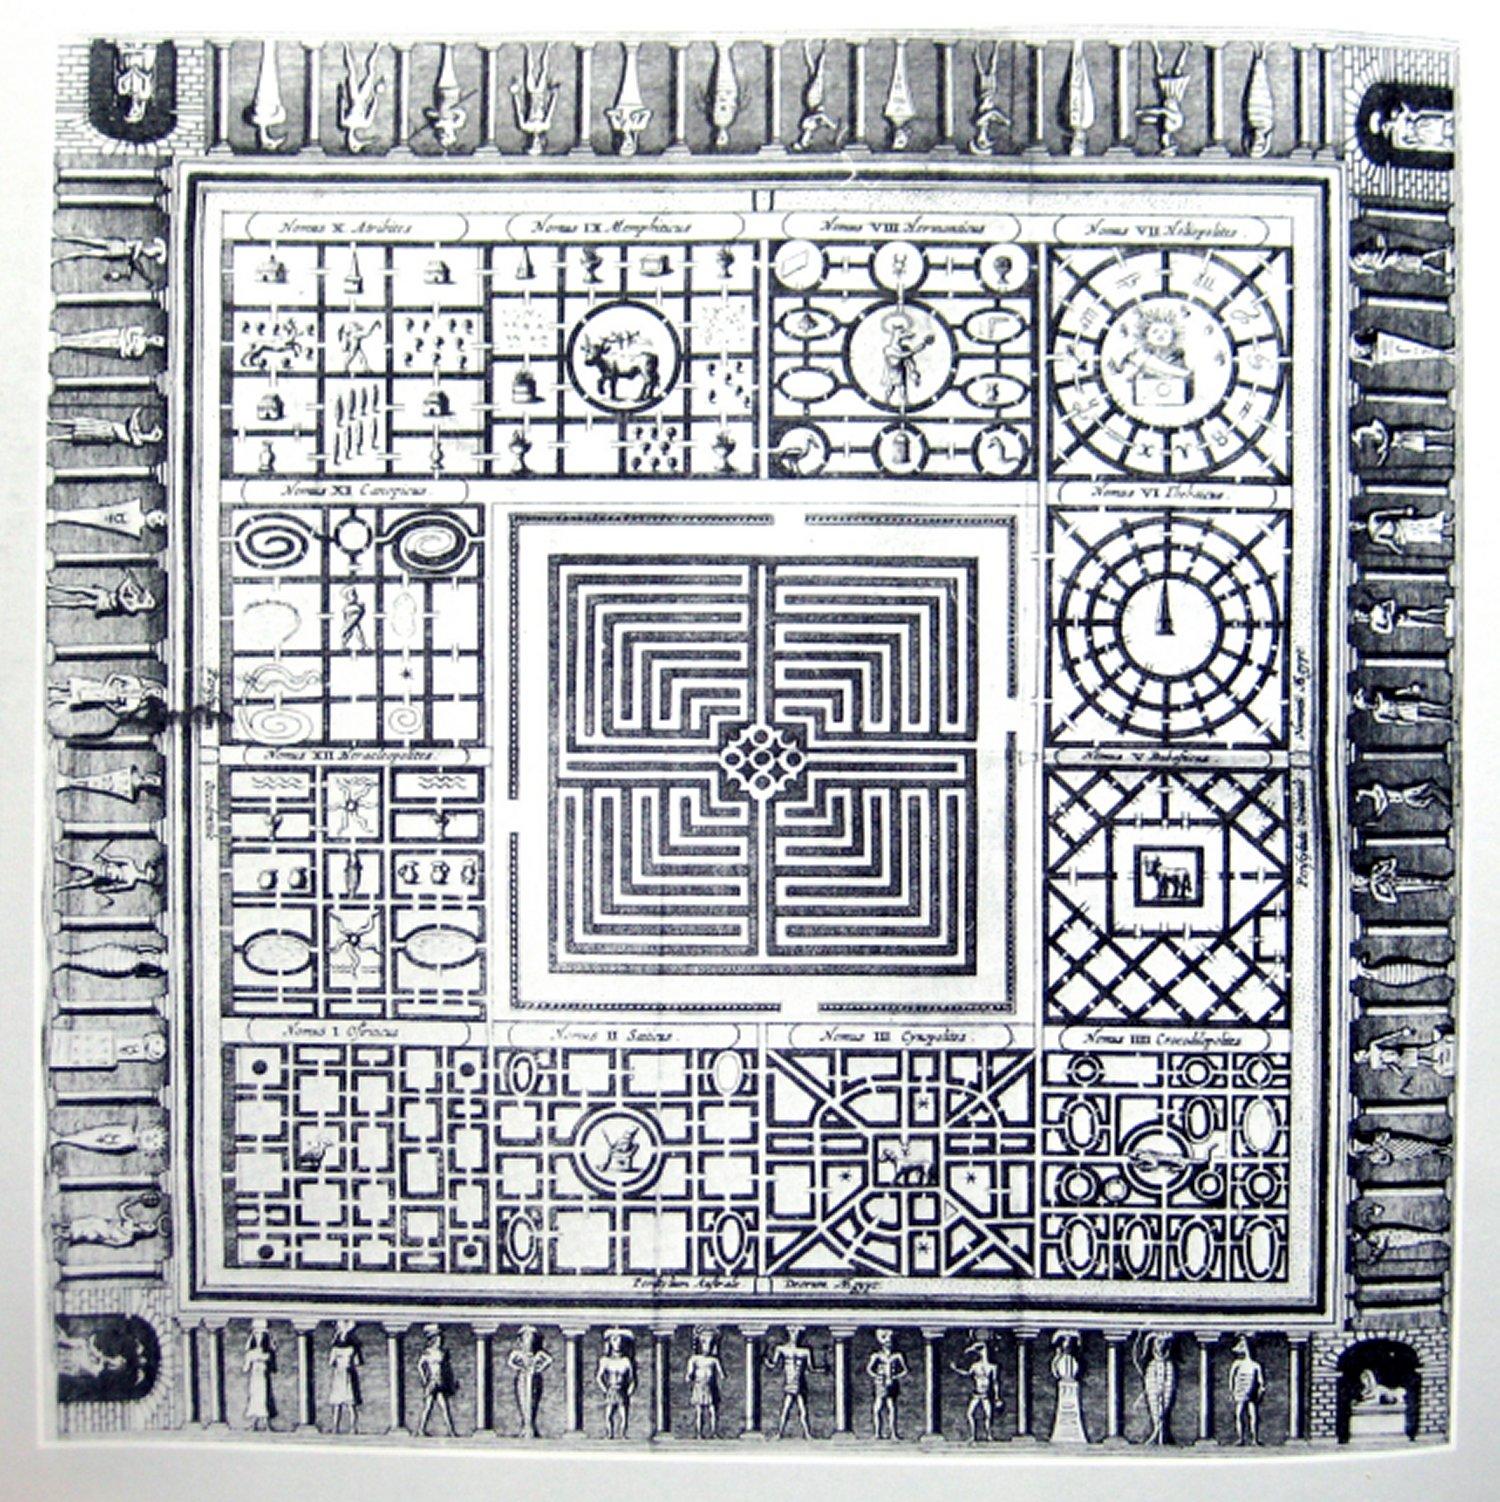 Tienduizenden jaren oud ondergronds labyrint complex gevonden in Egypte